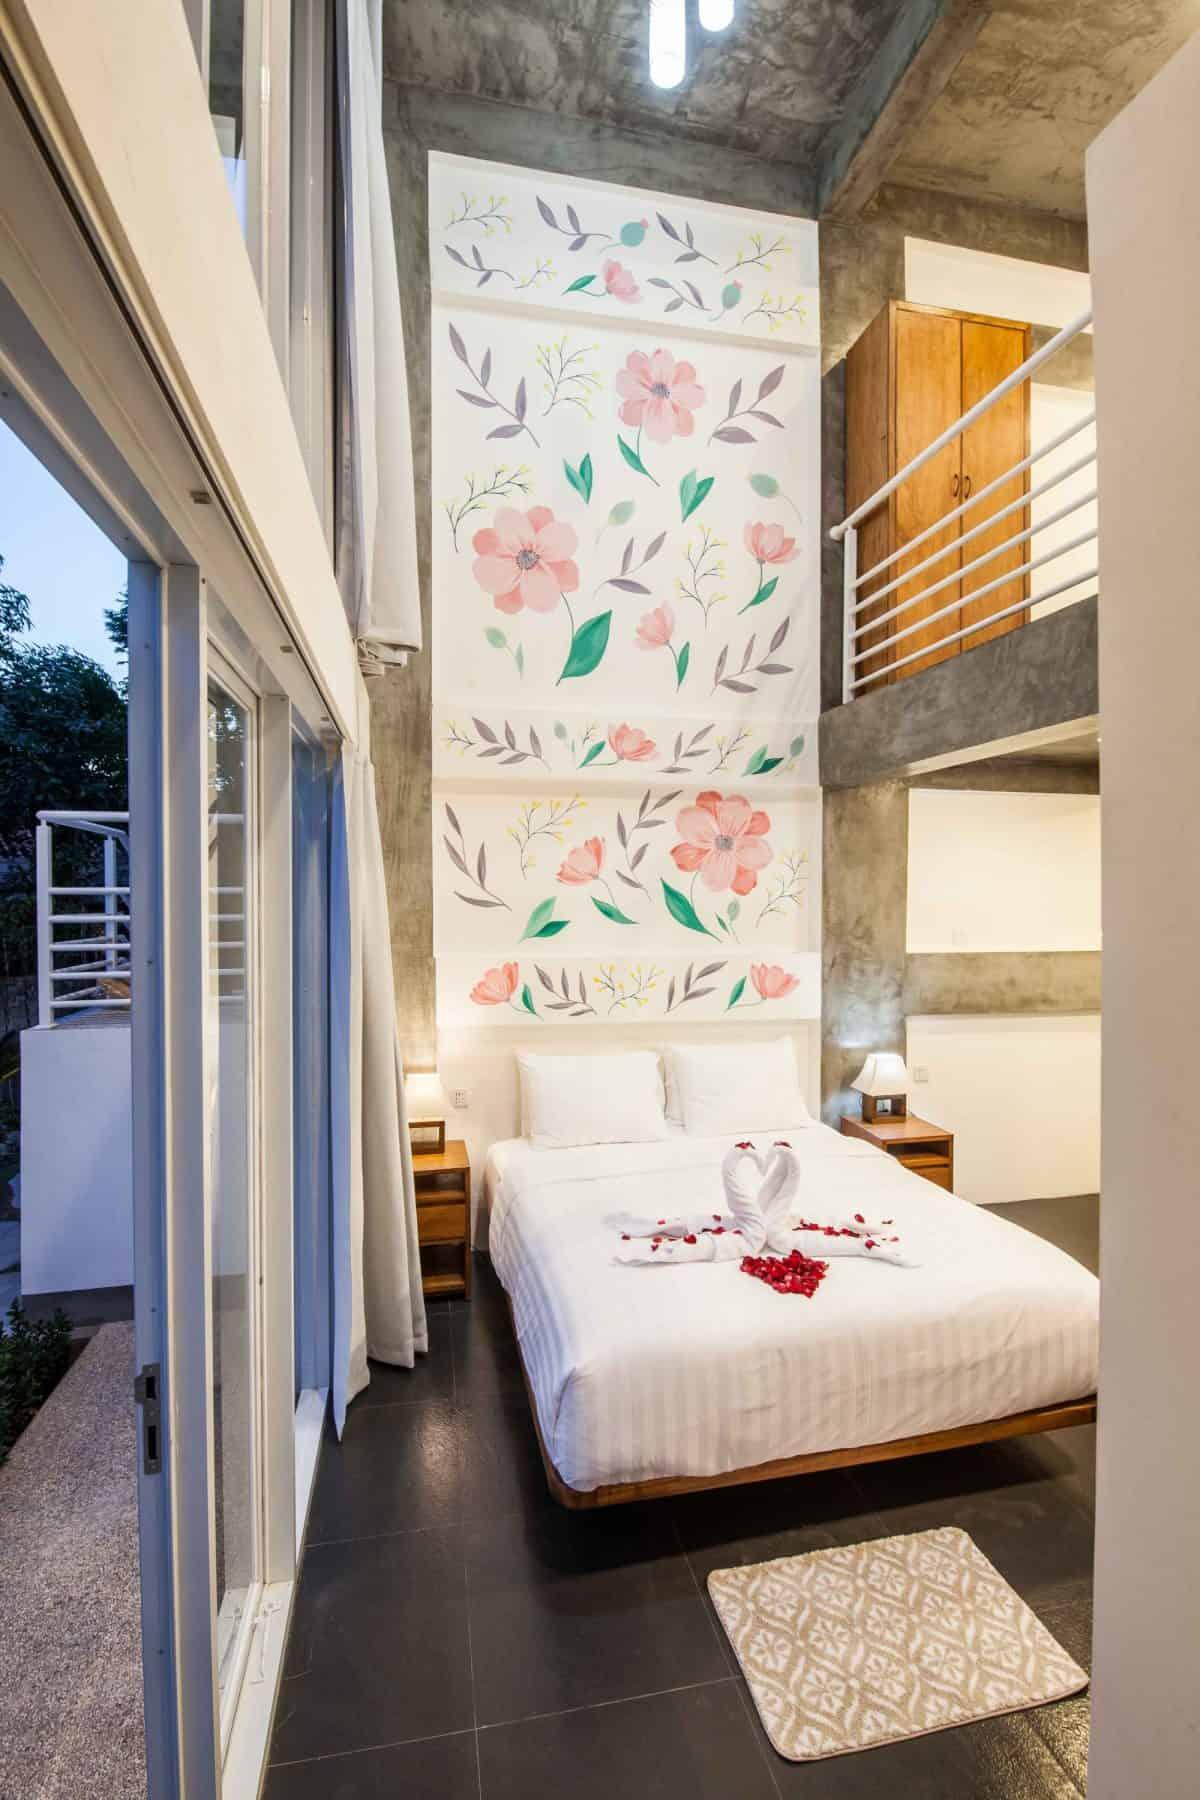 Our Rooms, Ohana Retreat Bali